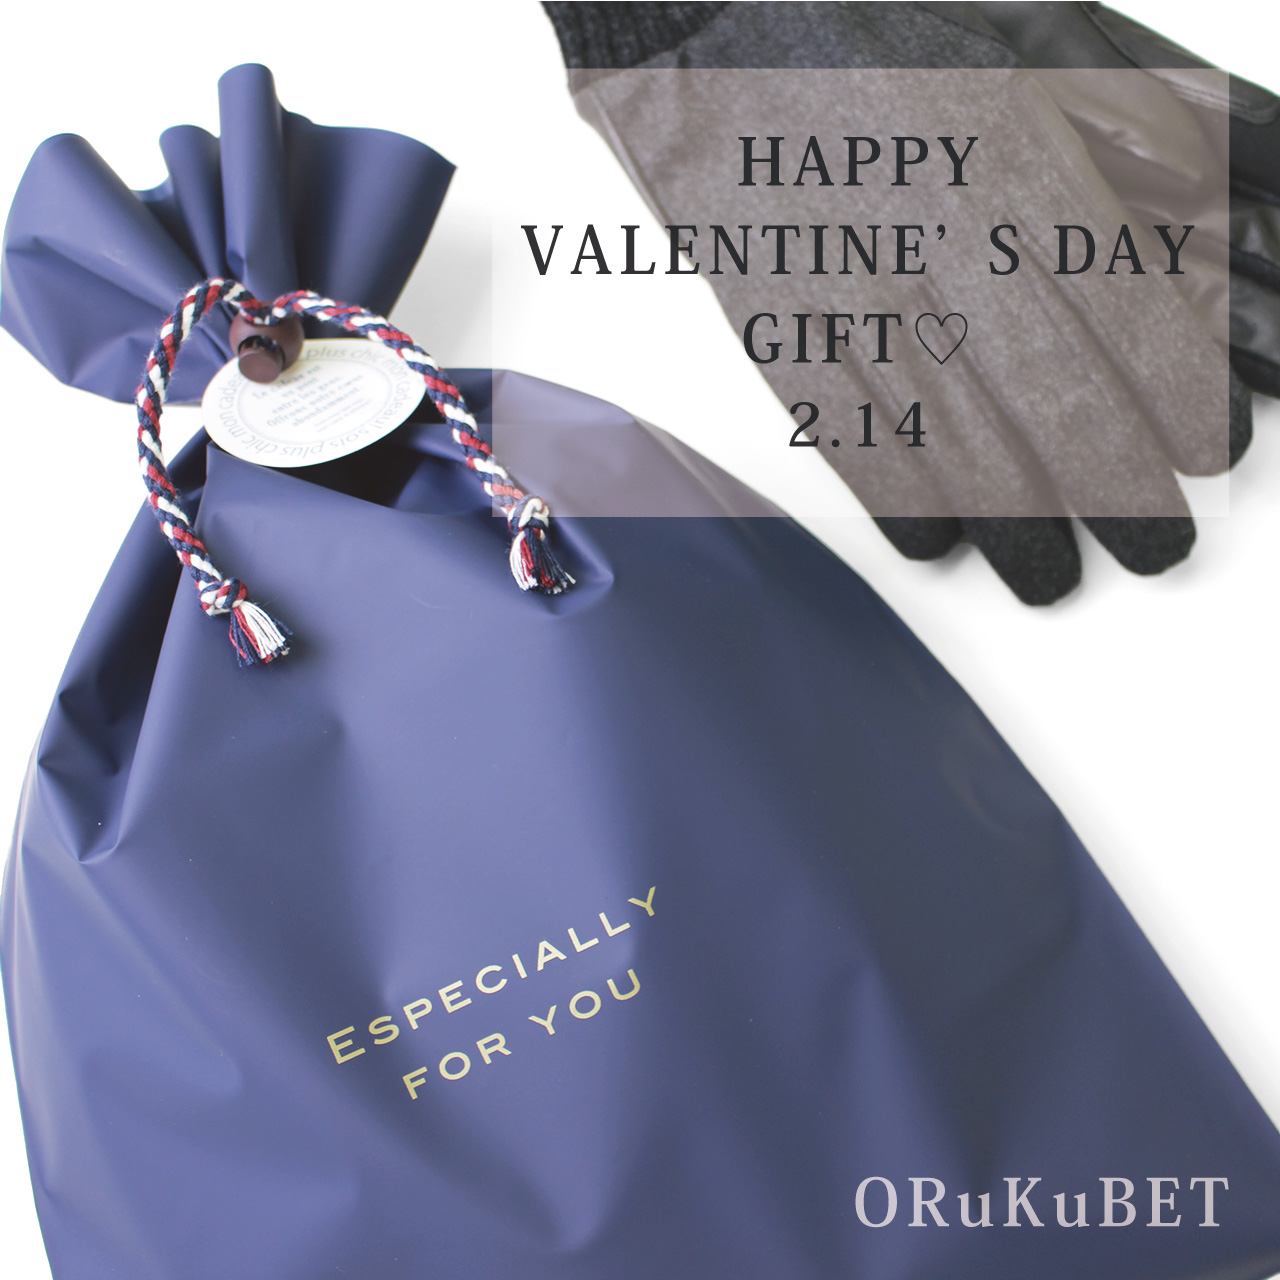 【ORuKuBET】\バレンタインデー ギフトラッピングキャンペーン開催/